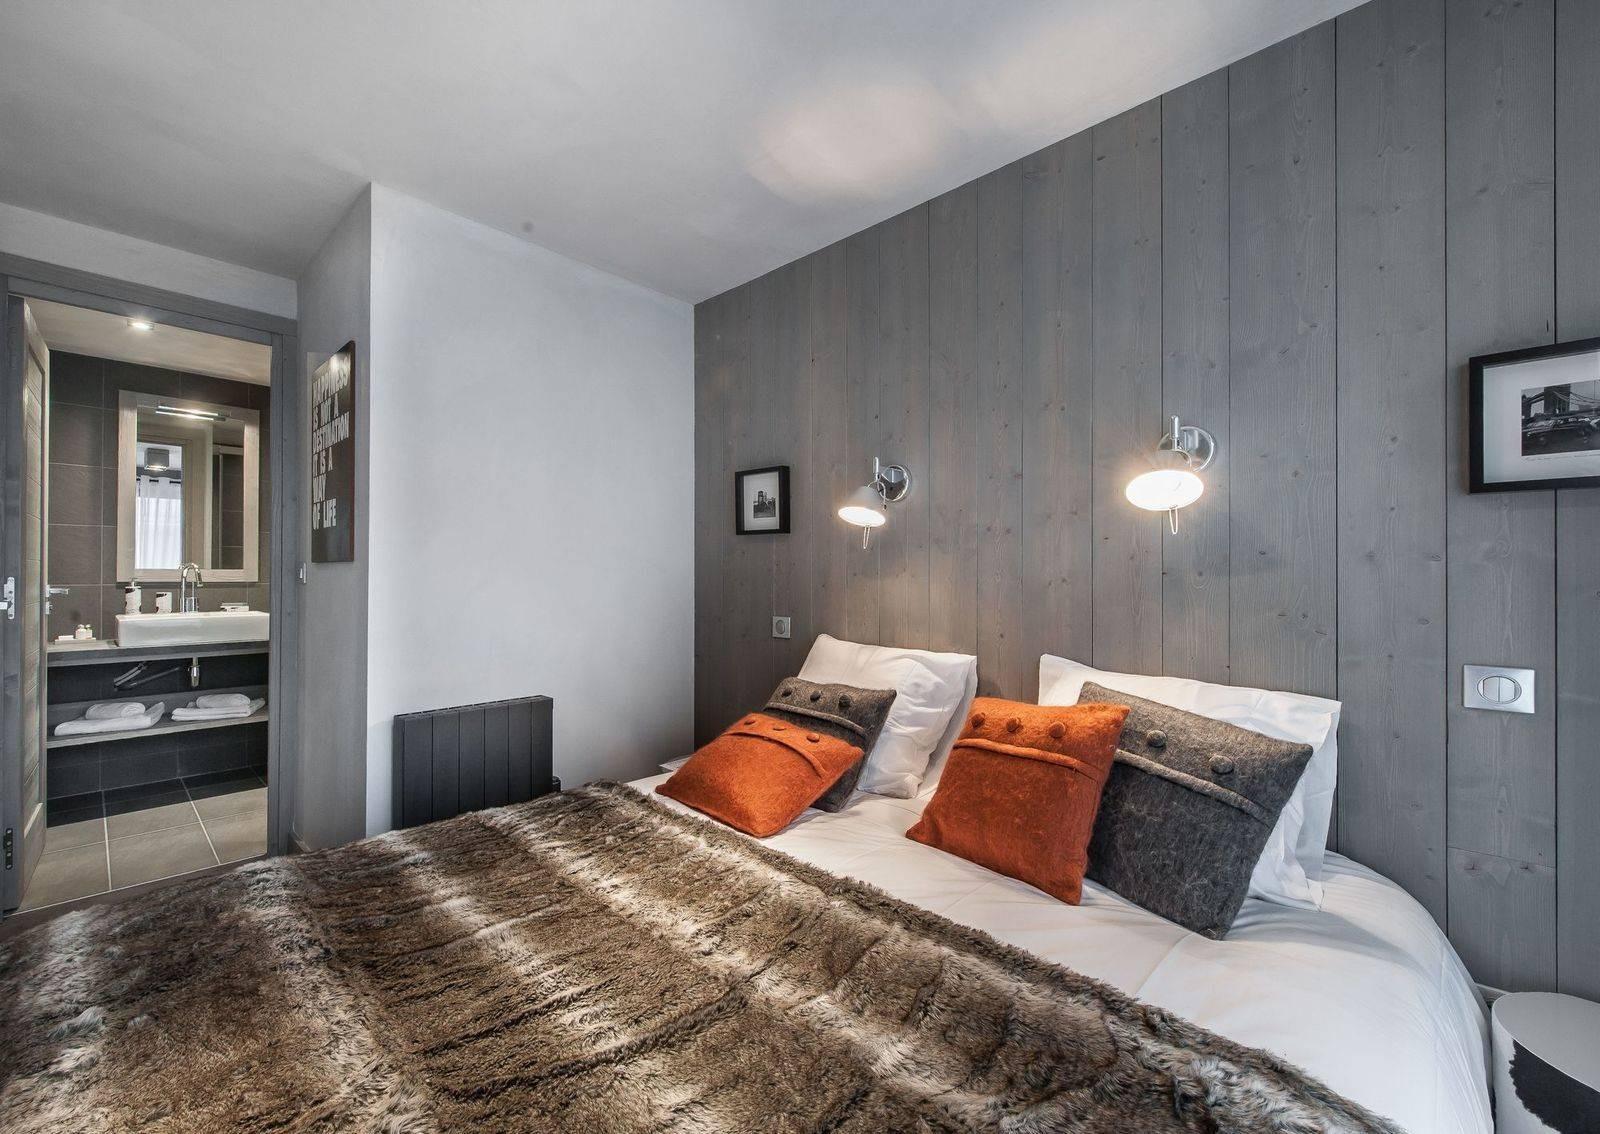 Courchevel 1650 Location Appartement Luxe Neustadelite Chambre 5